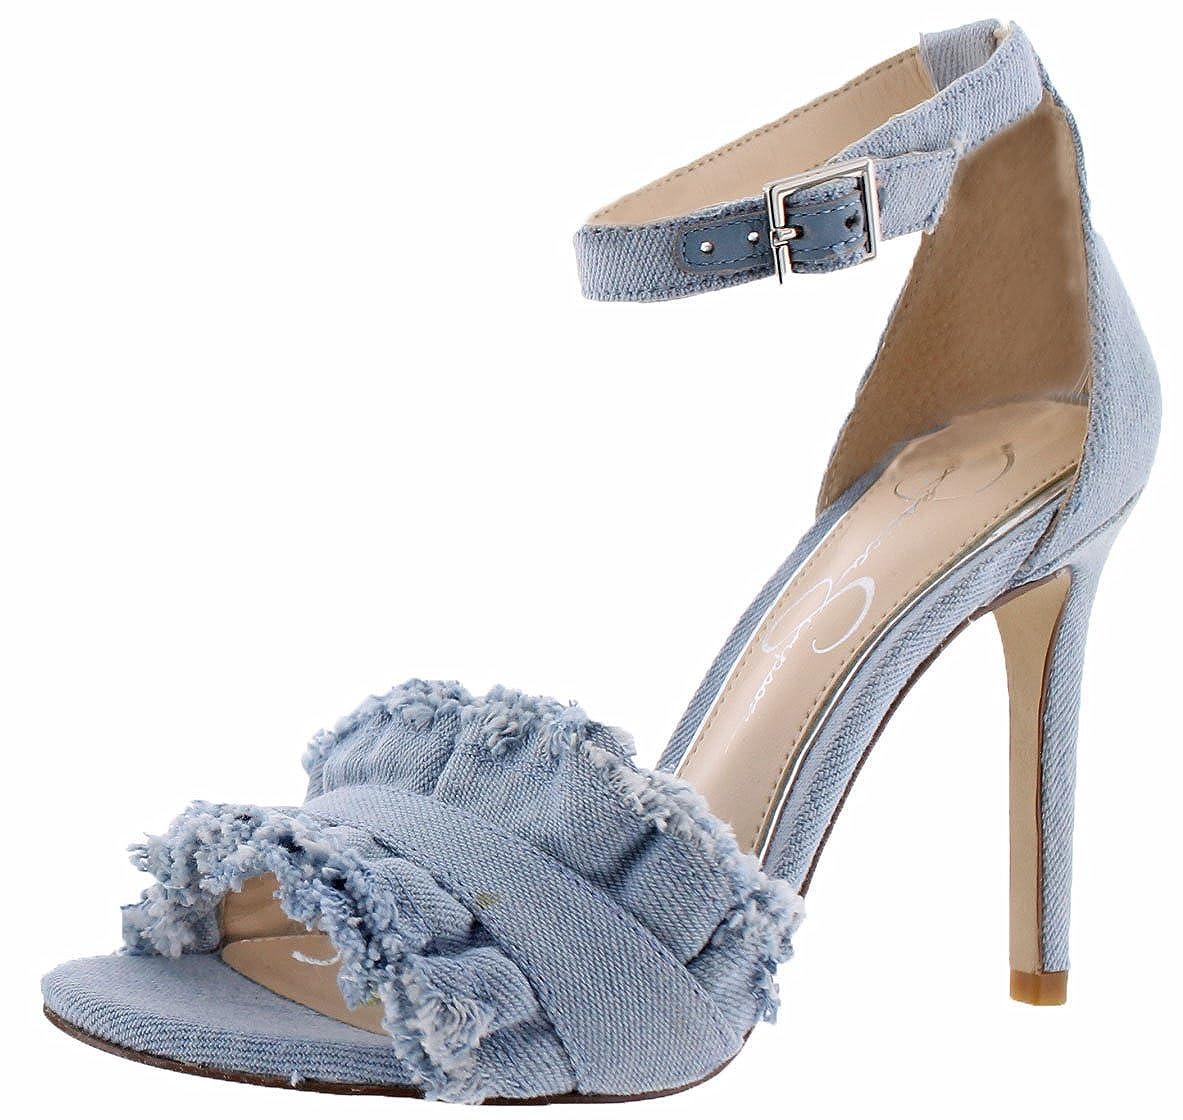 Jessica Simpson Frauen Frauen Simpson Flache Sandalen Blau Vintage 3b58bf